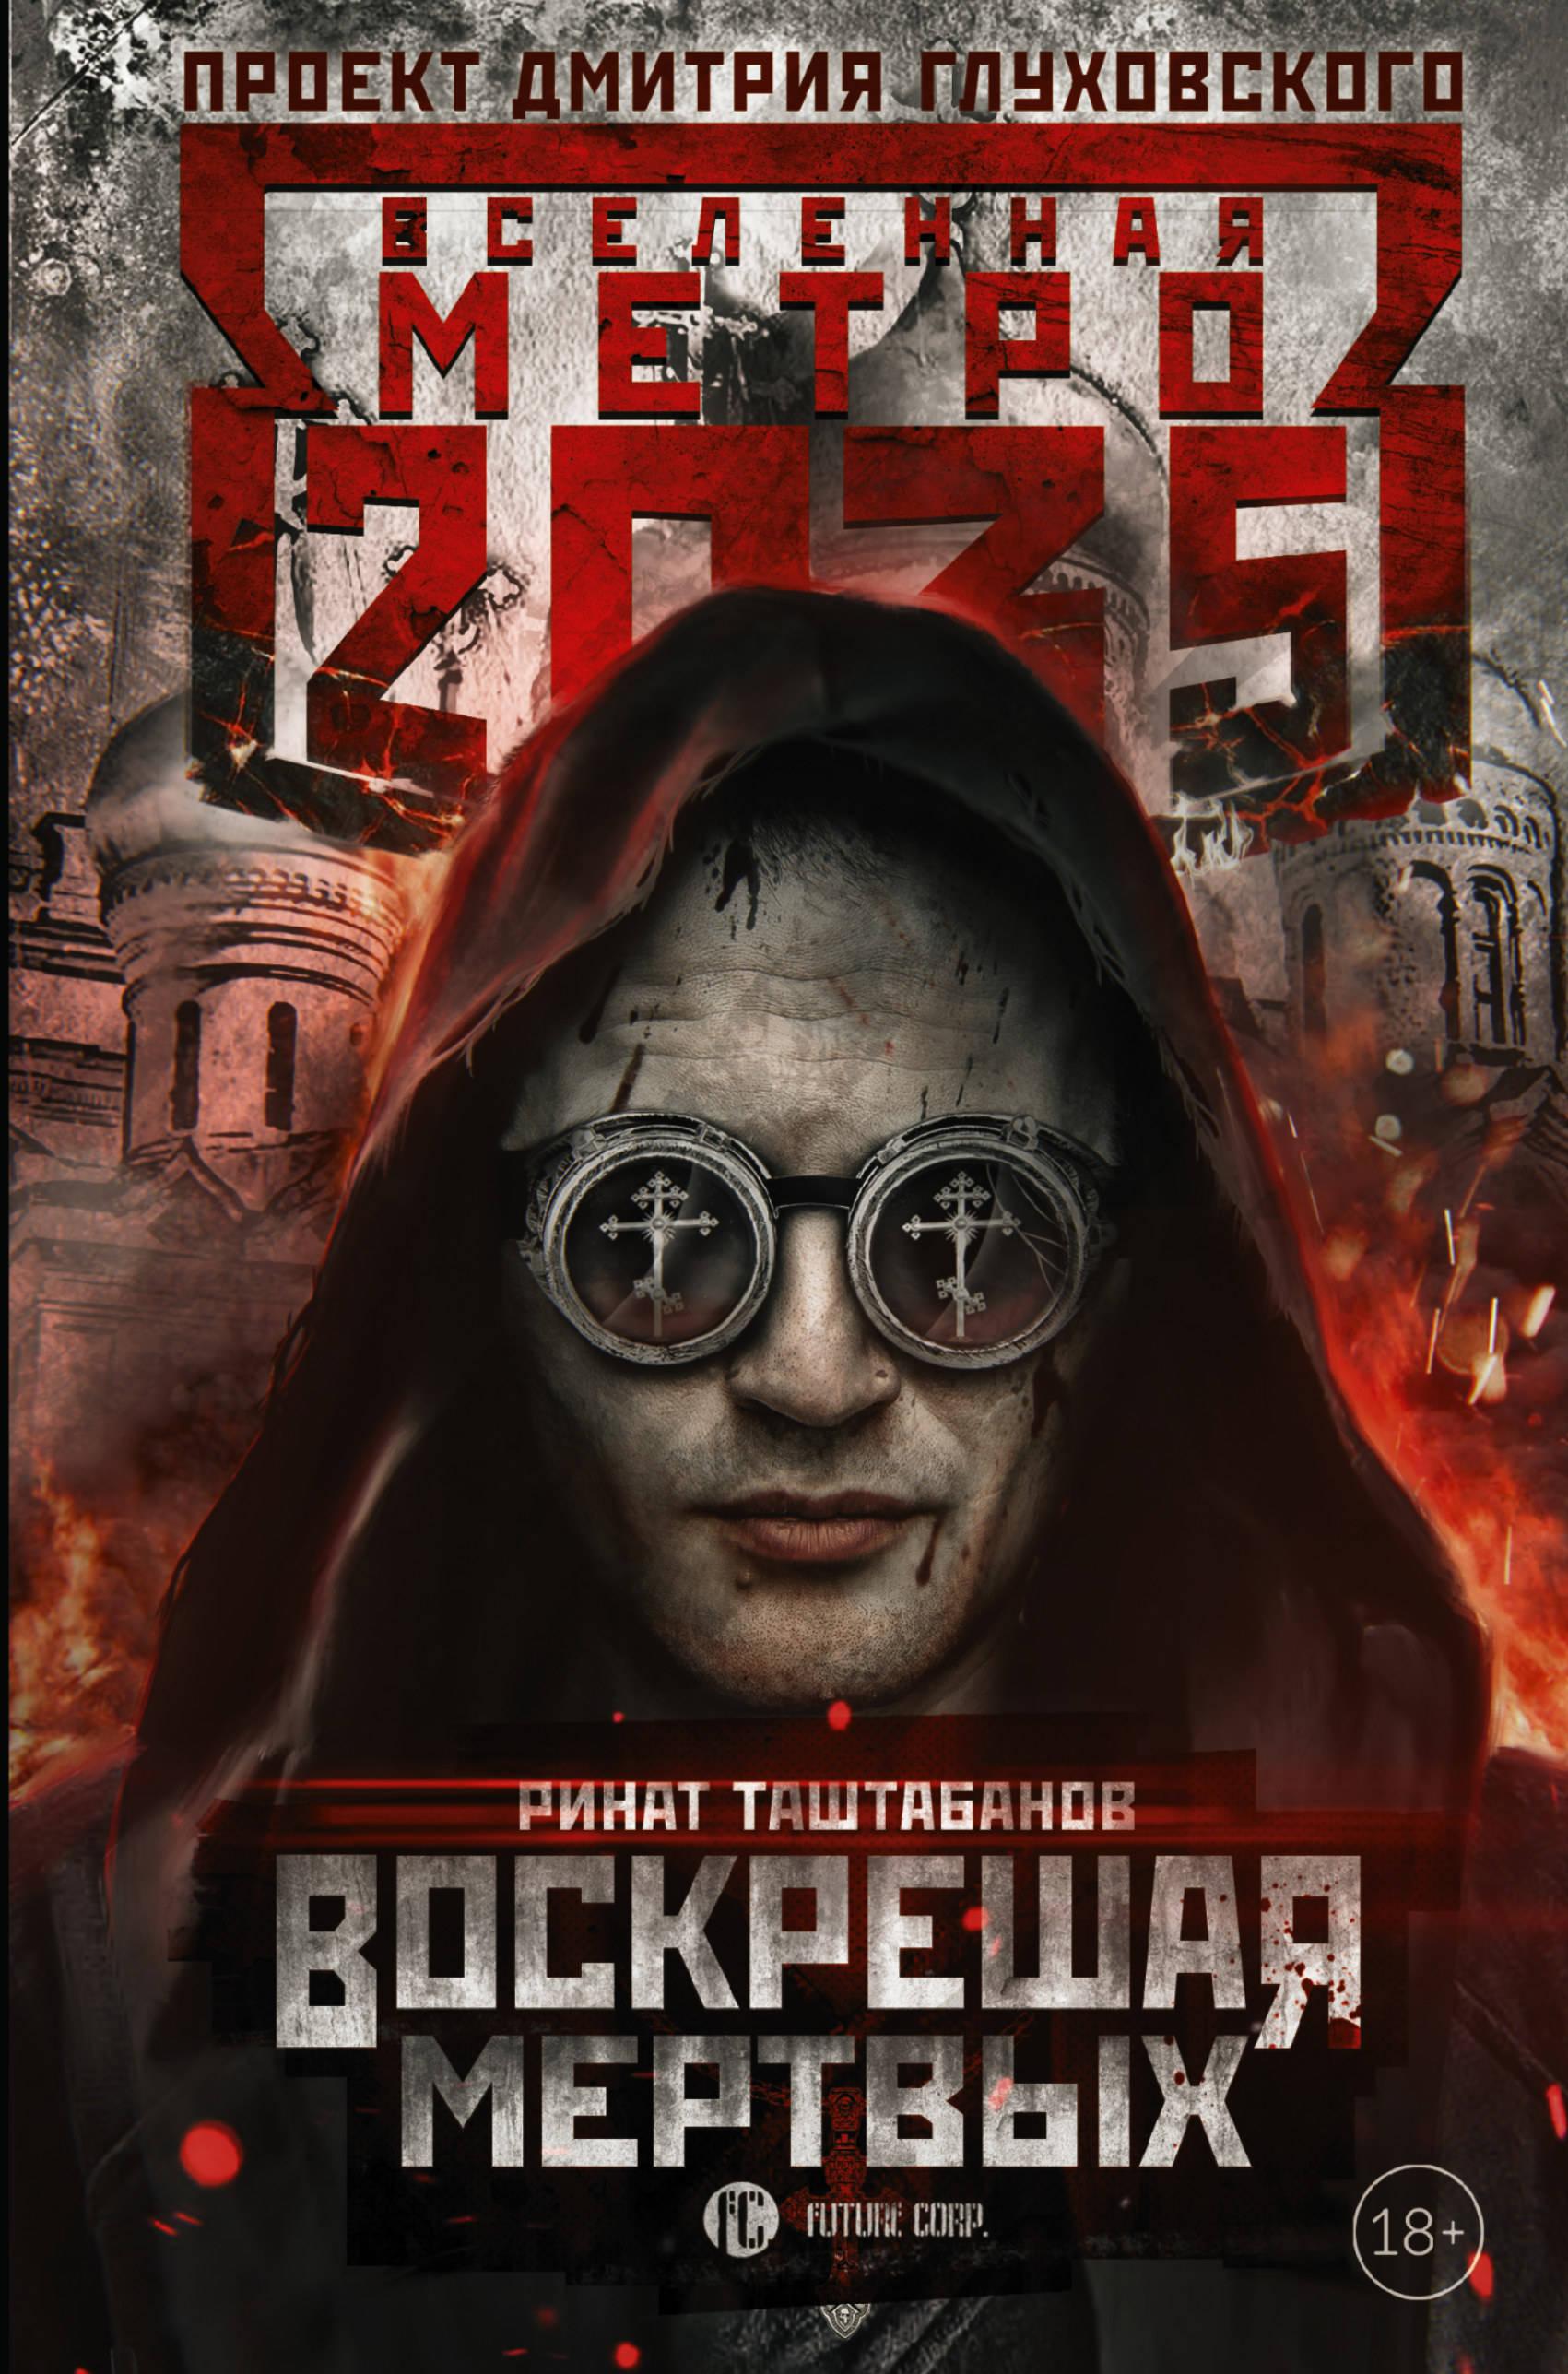 Ринат Таштабано Метро 2035. оскрешая мертых